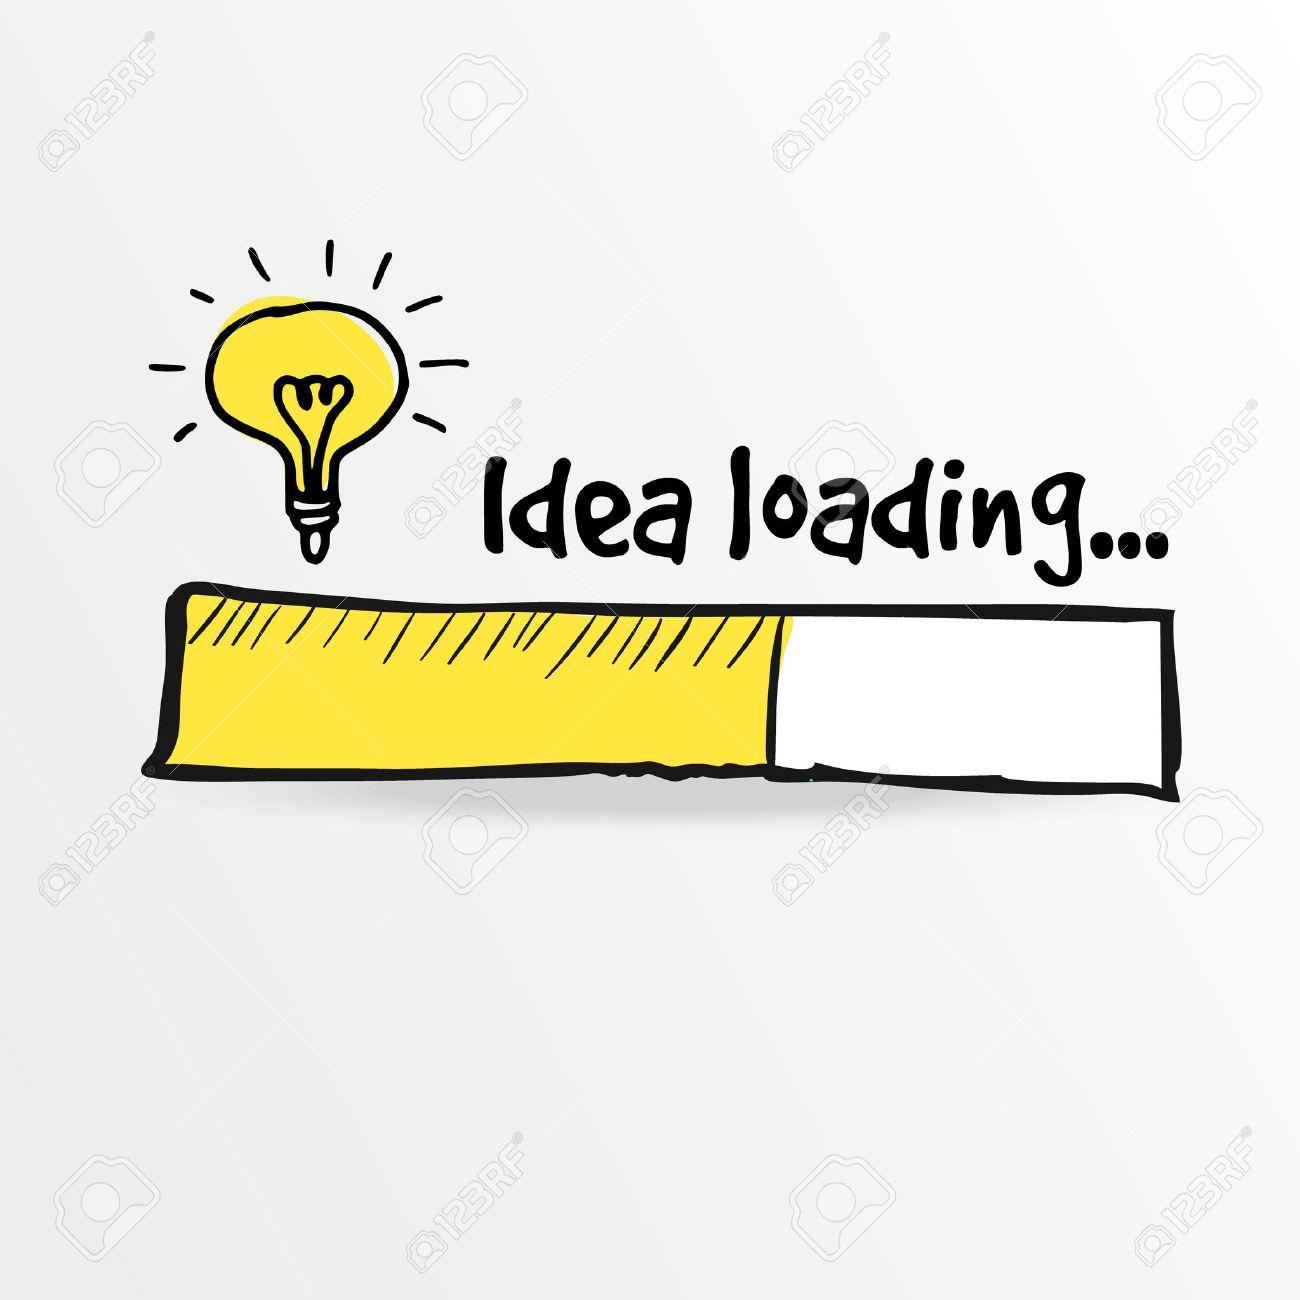 Loading bar with bulb, creativity, big idea, innovation concept, vector illustration sketch - 42122897